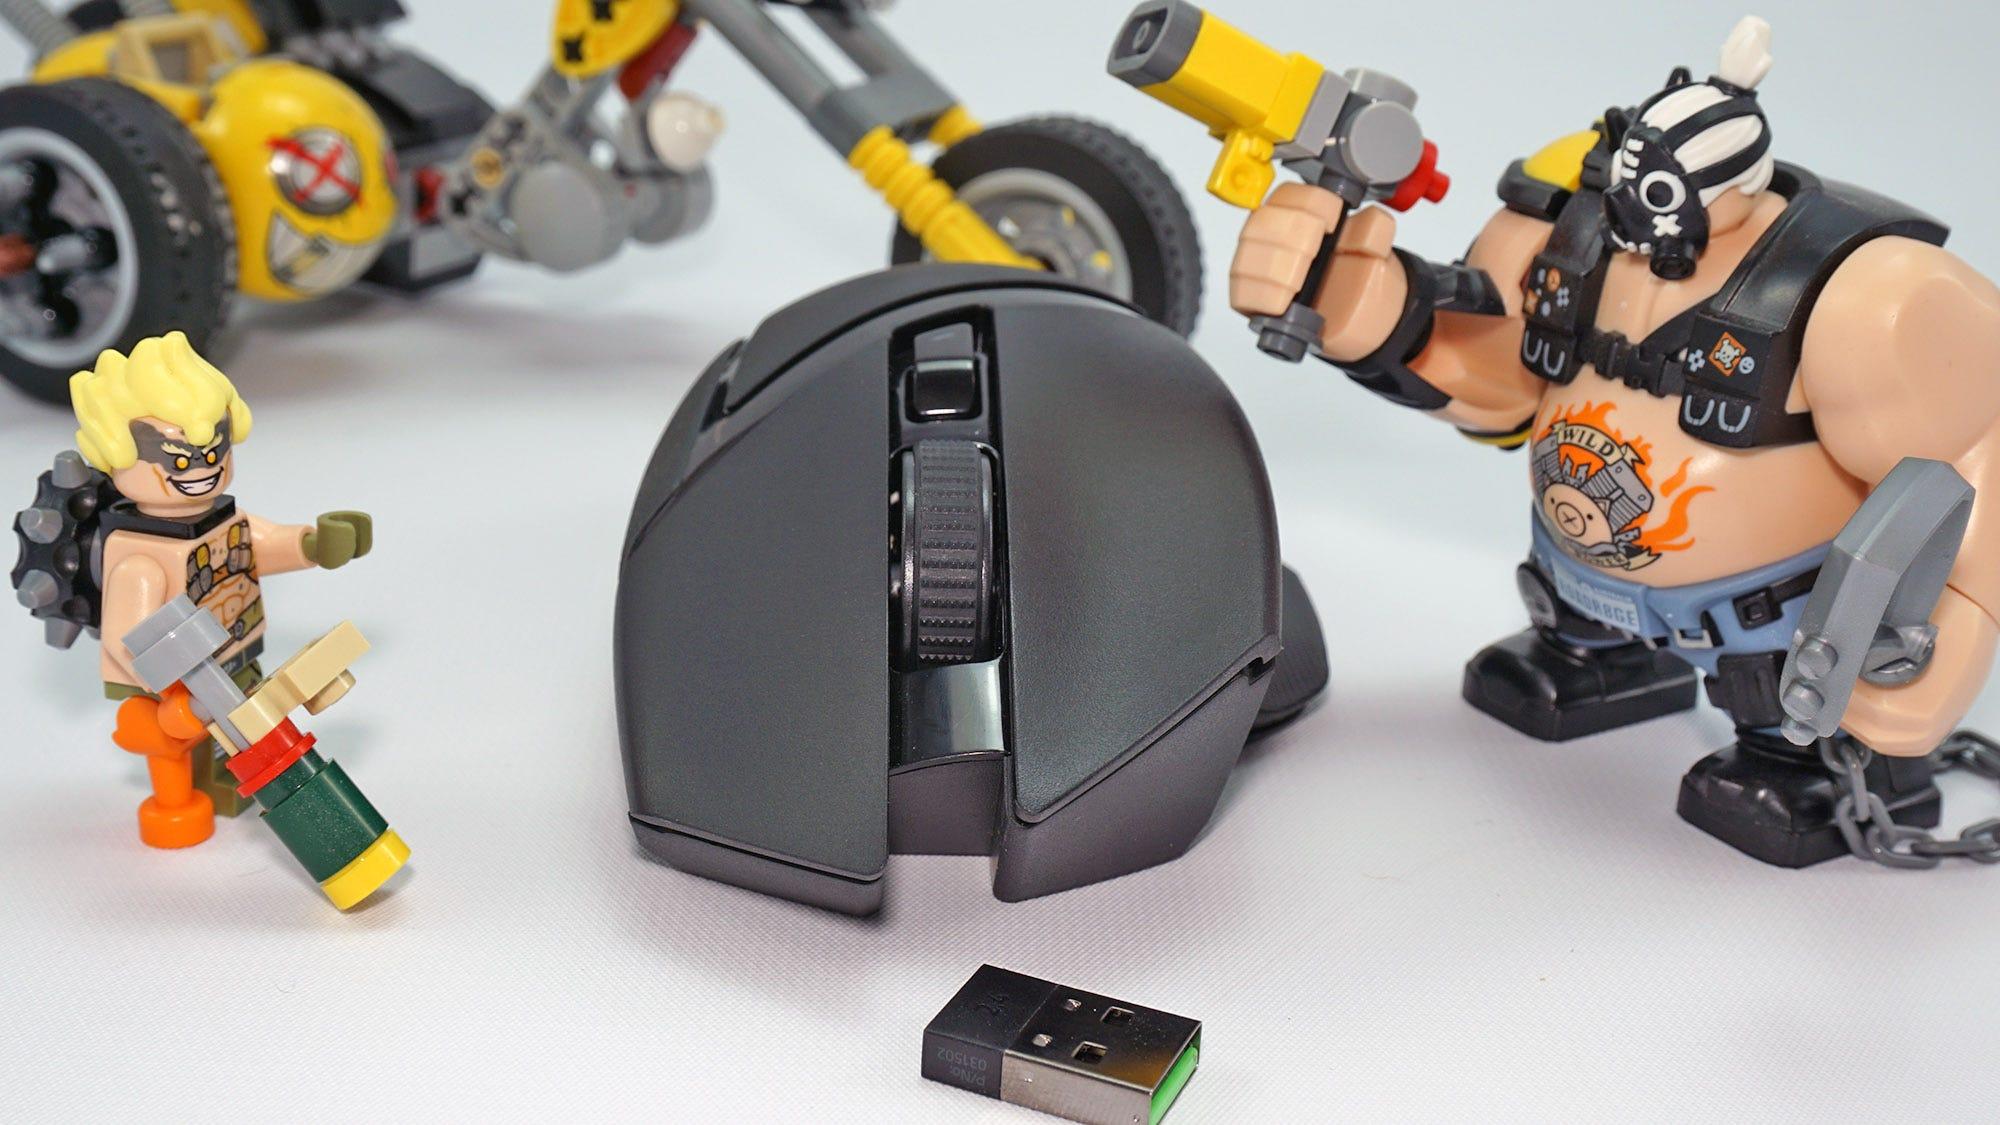 The Basilisk with Overwatch LEGO figures.